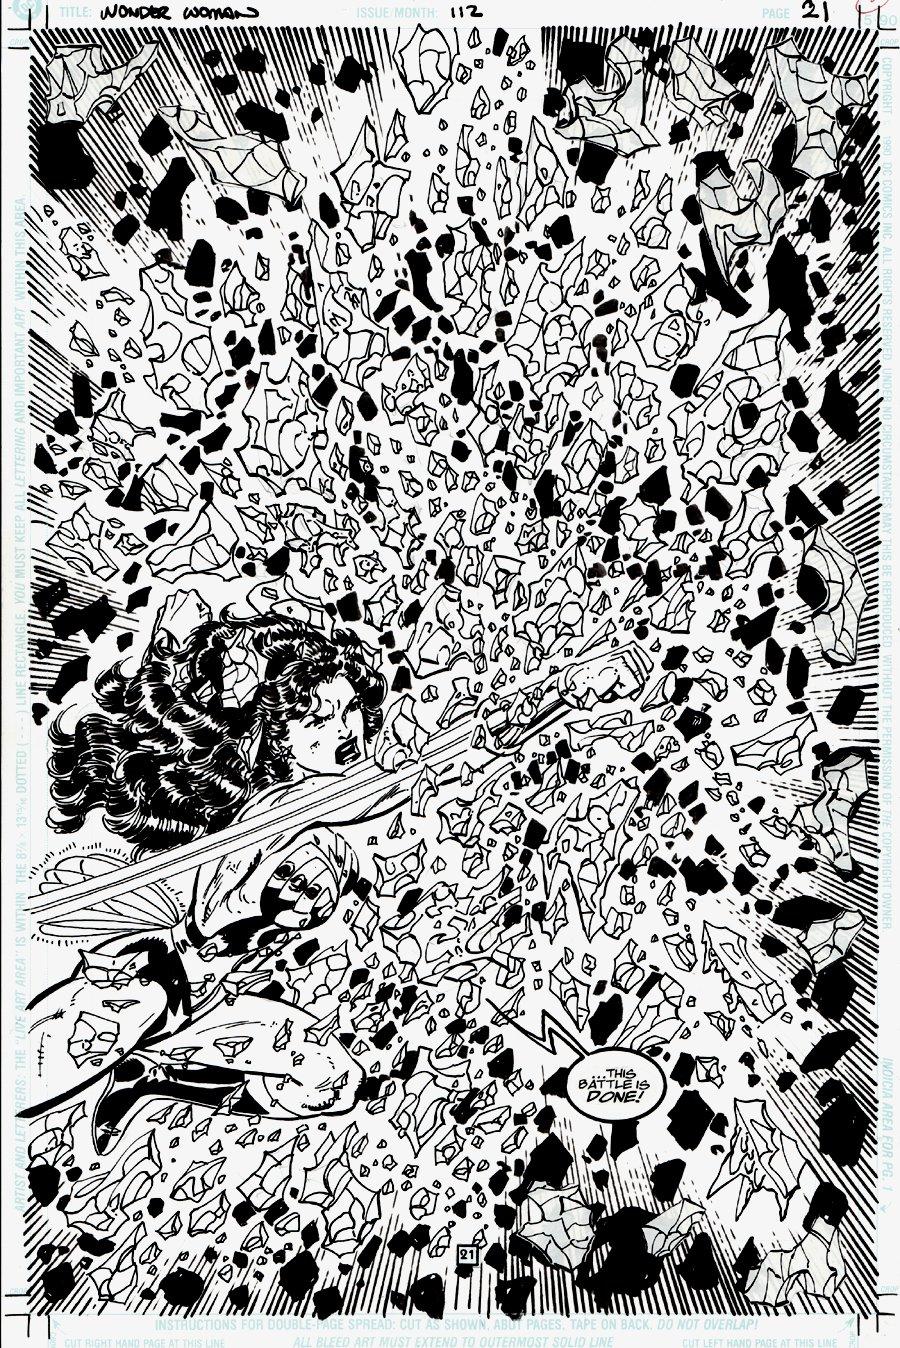 Wonder Woman #112 p 21 SPLASH (1996)